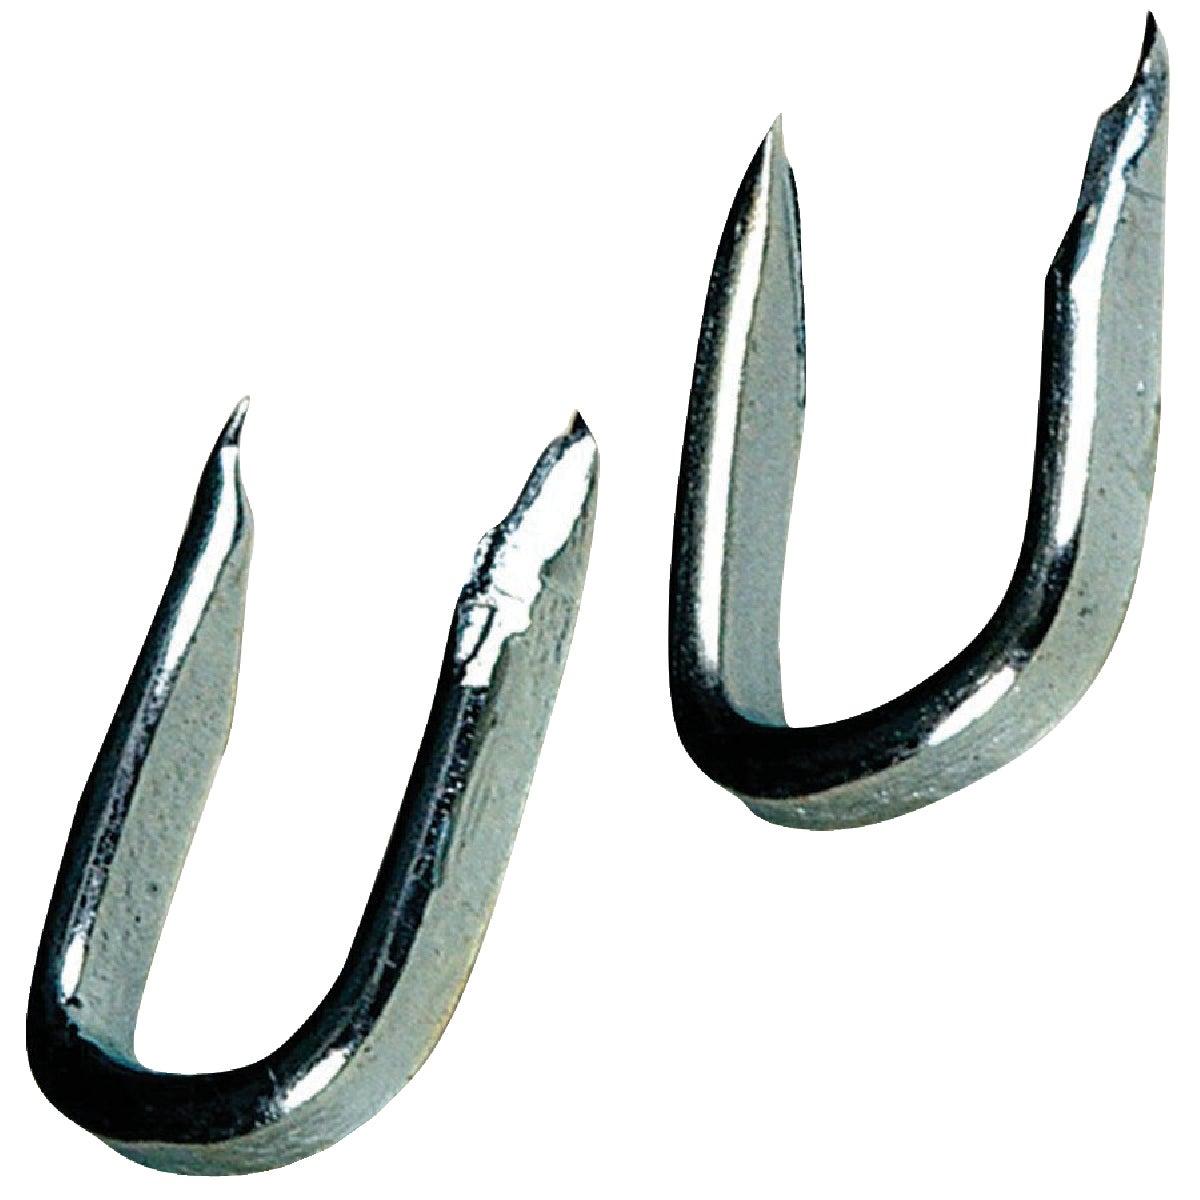 Hillman Anchor Wire 3/8 In. 5 ga Galvanized Steel Fence Staple (6 Ct., 1.5 Oz.)